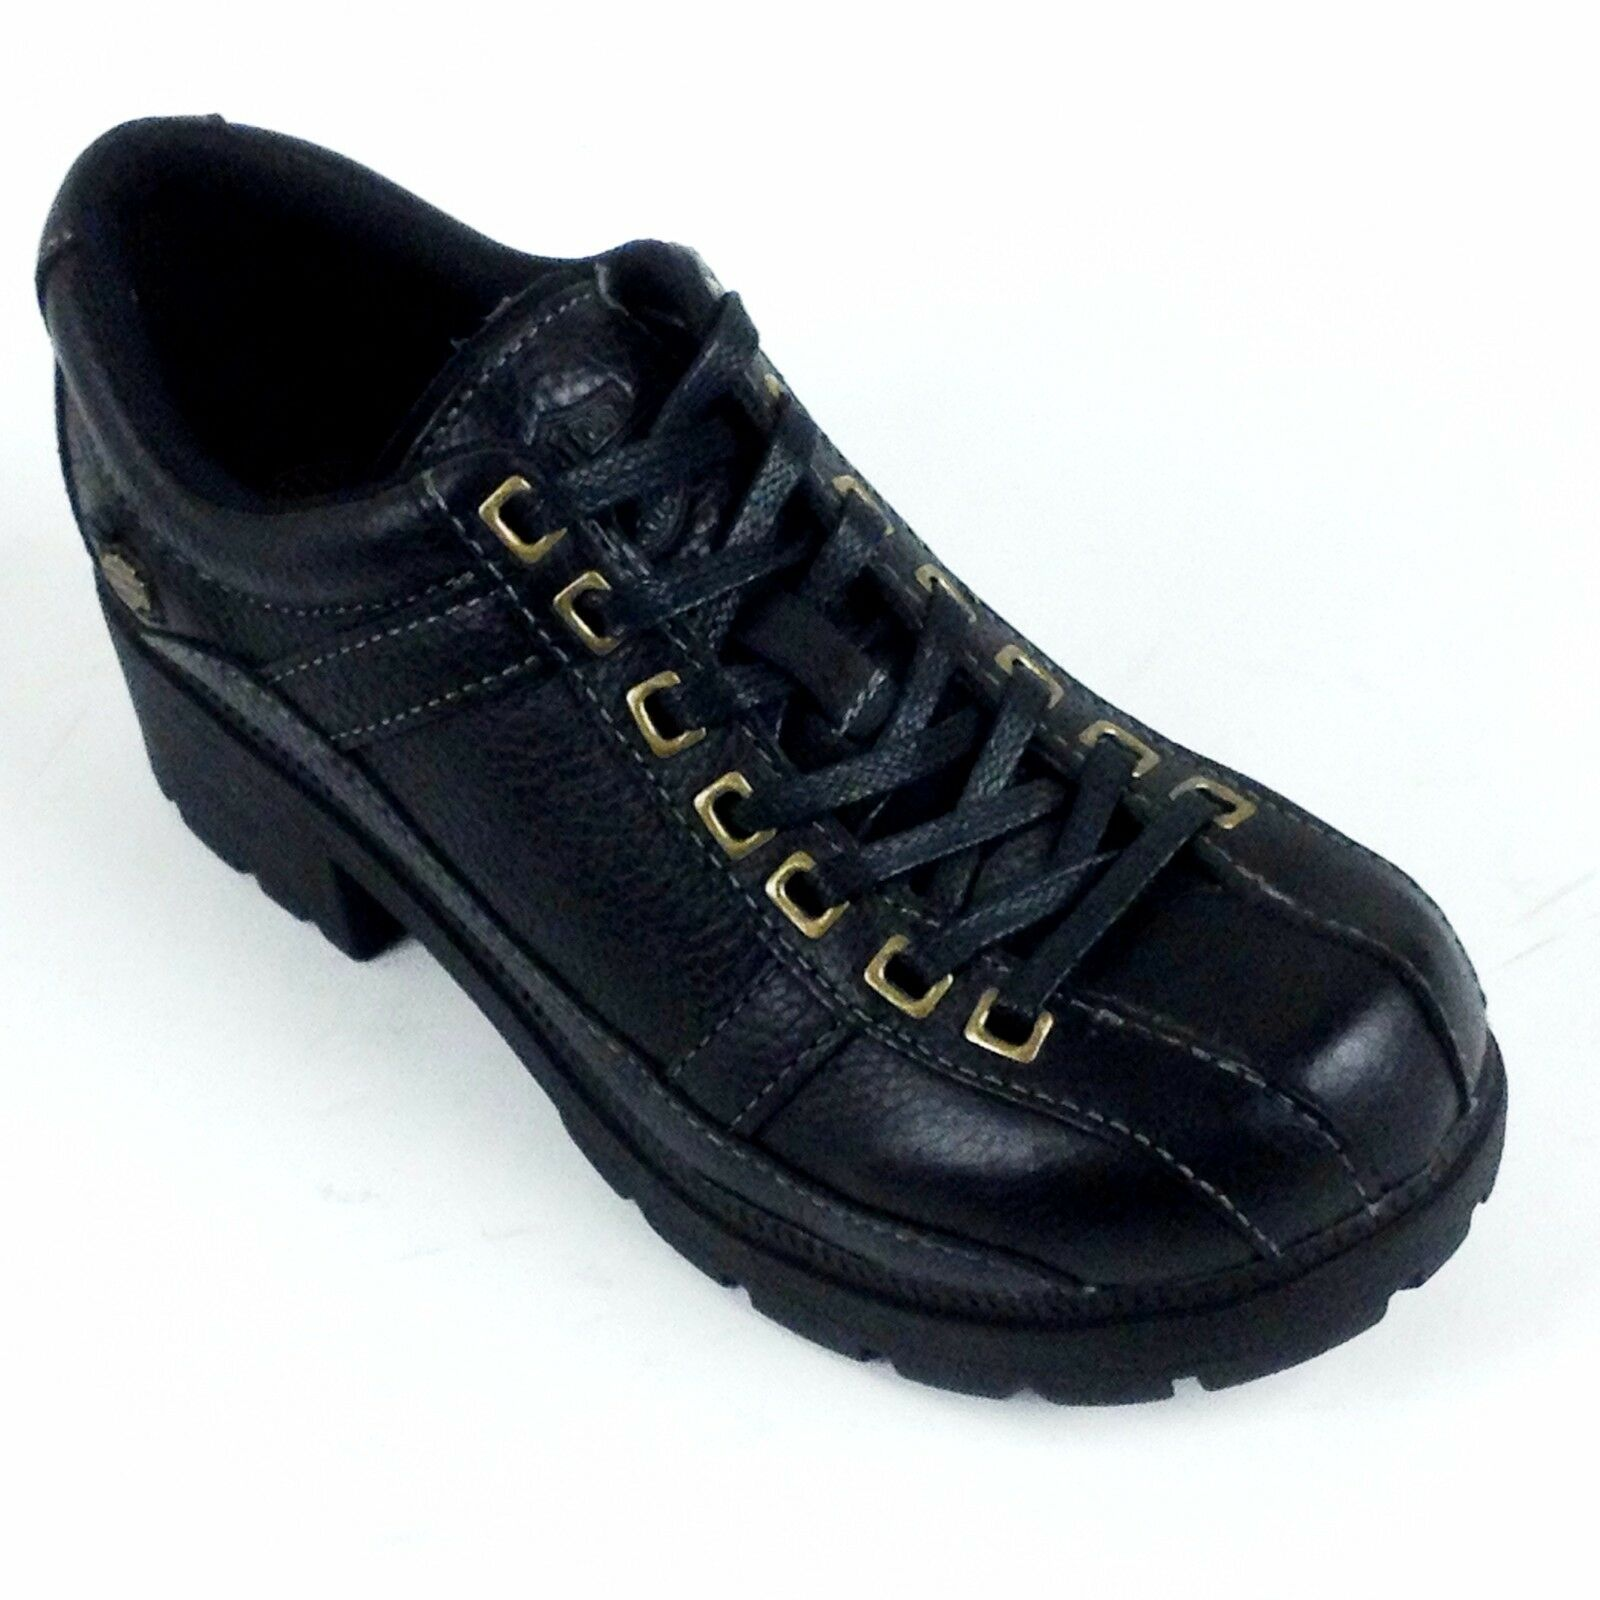 Harley-Davidson femmes femmes femmes noir TILLI OXFORD CASUAL chaussures STYLE D83260 Taille  6 9a4f73